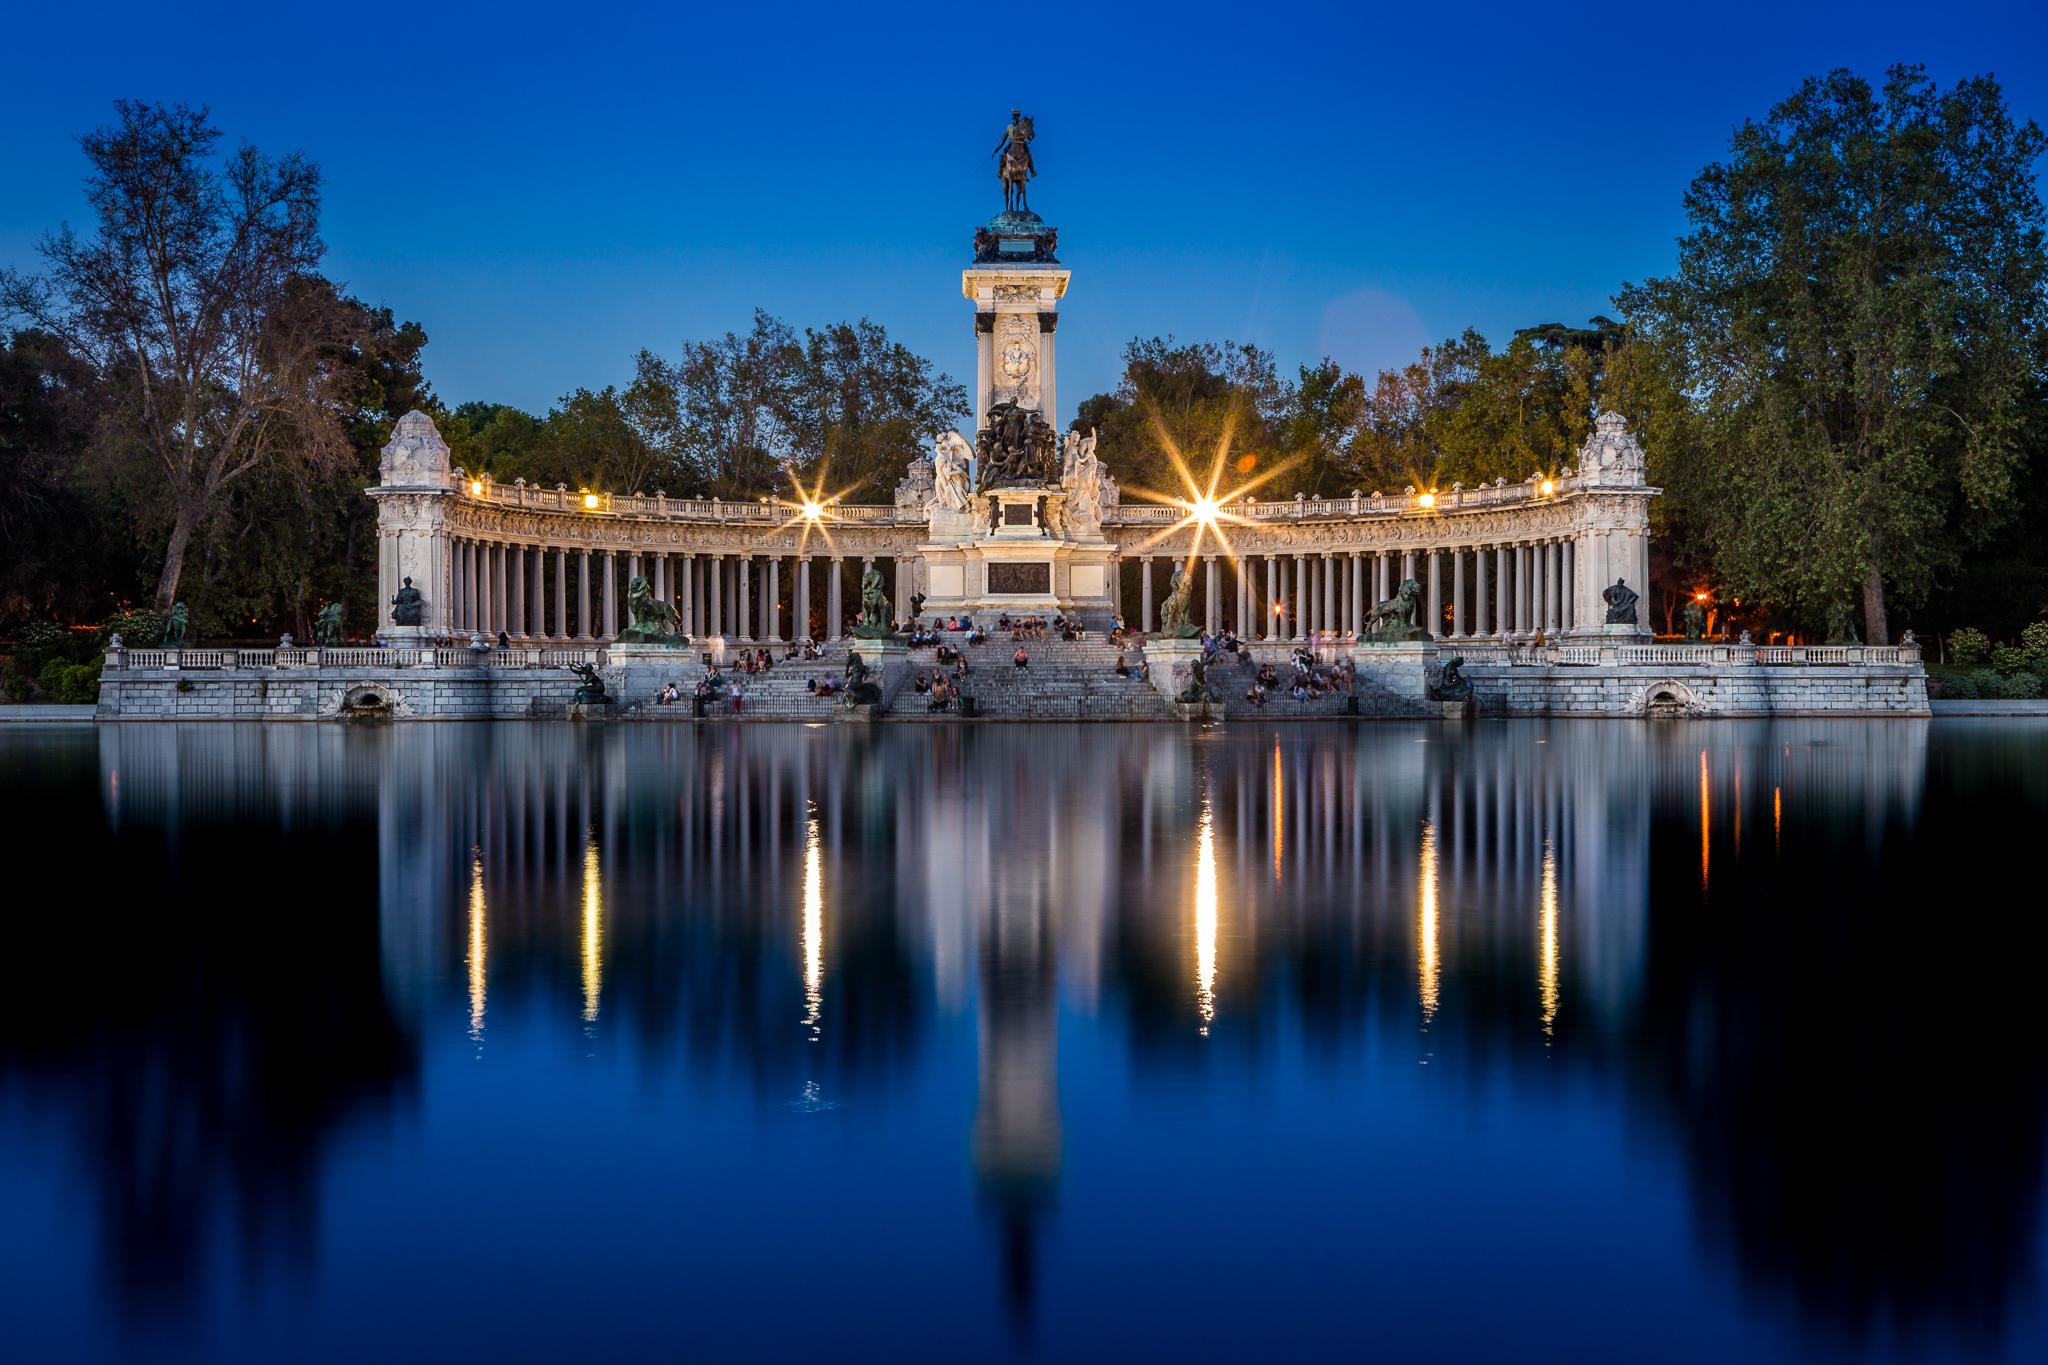 Monumento Alfonso XII, Madrid, Spain